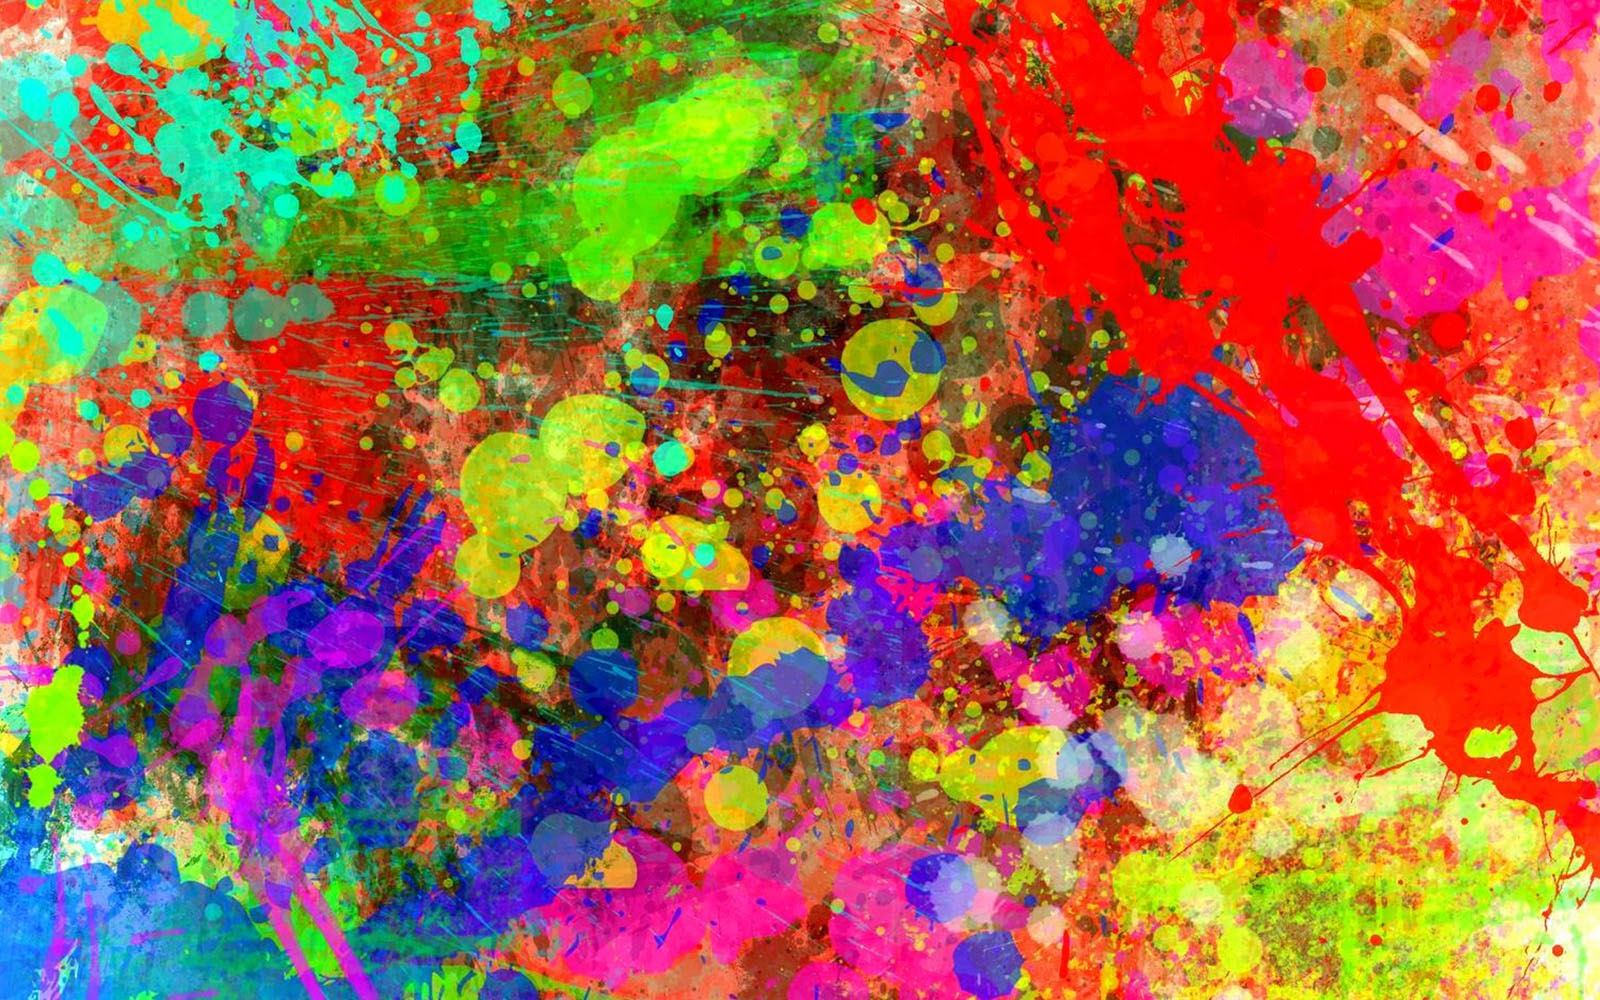 explosion wallpaper iphone